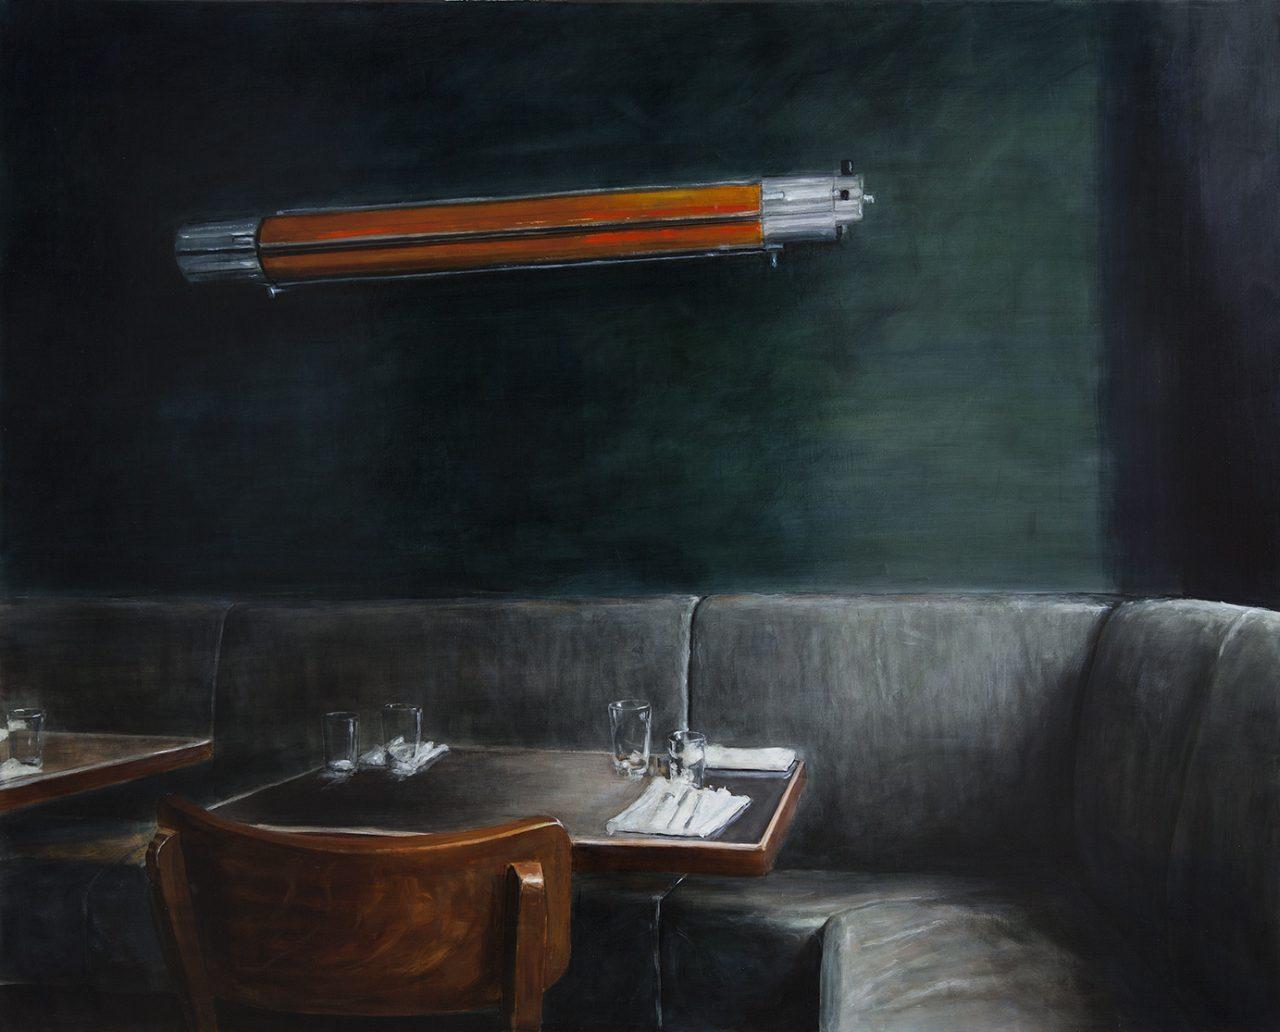 am licht, 2017, öl/leinwand, 140 x 160 cm